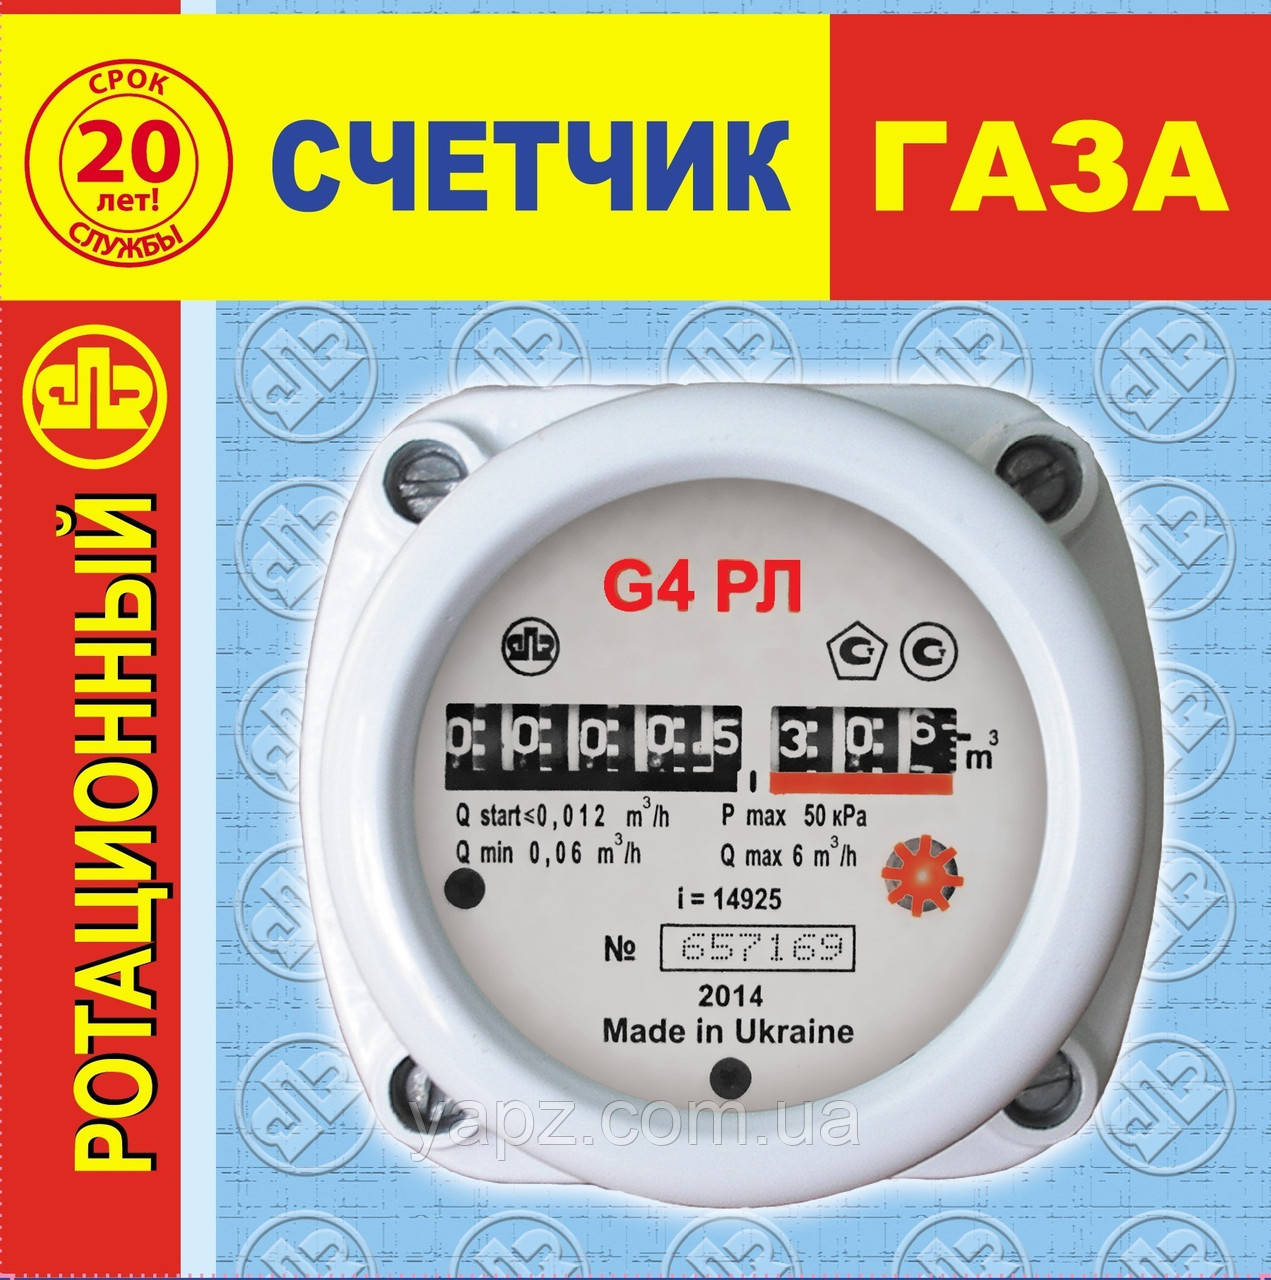 ротационный счетчик газа g6